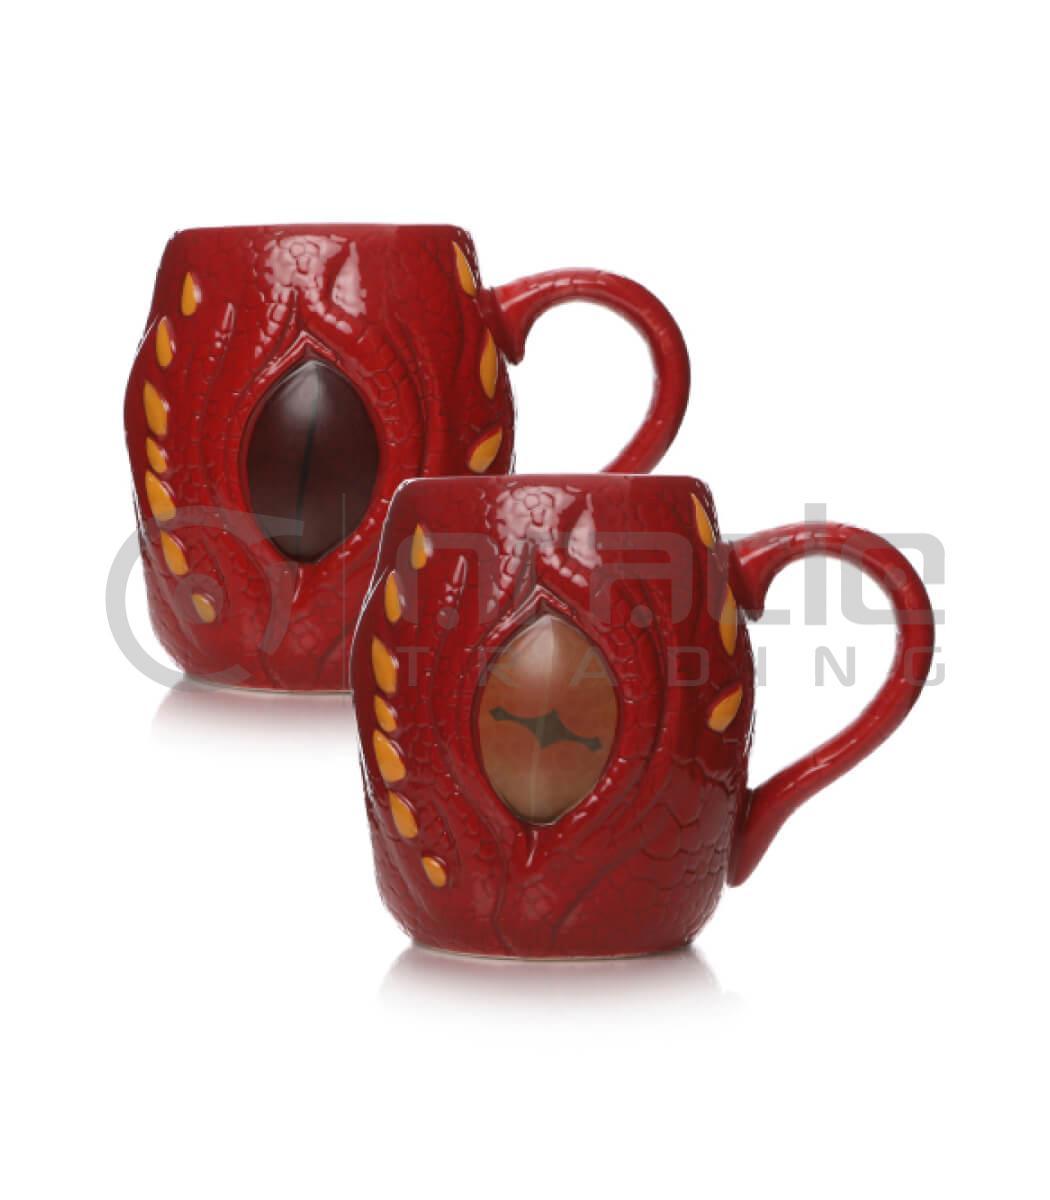 The Hobbit 3D Heat Reveal Mug - Smaug